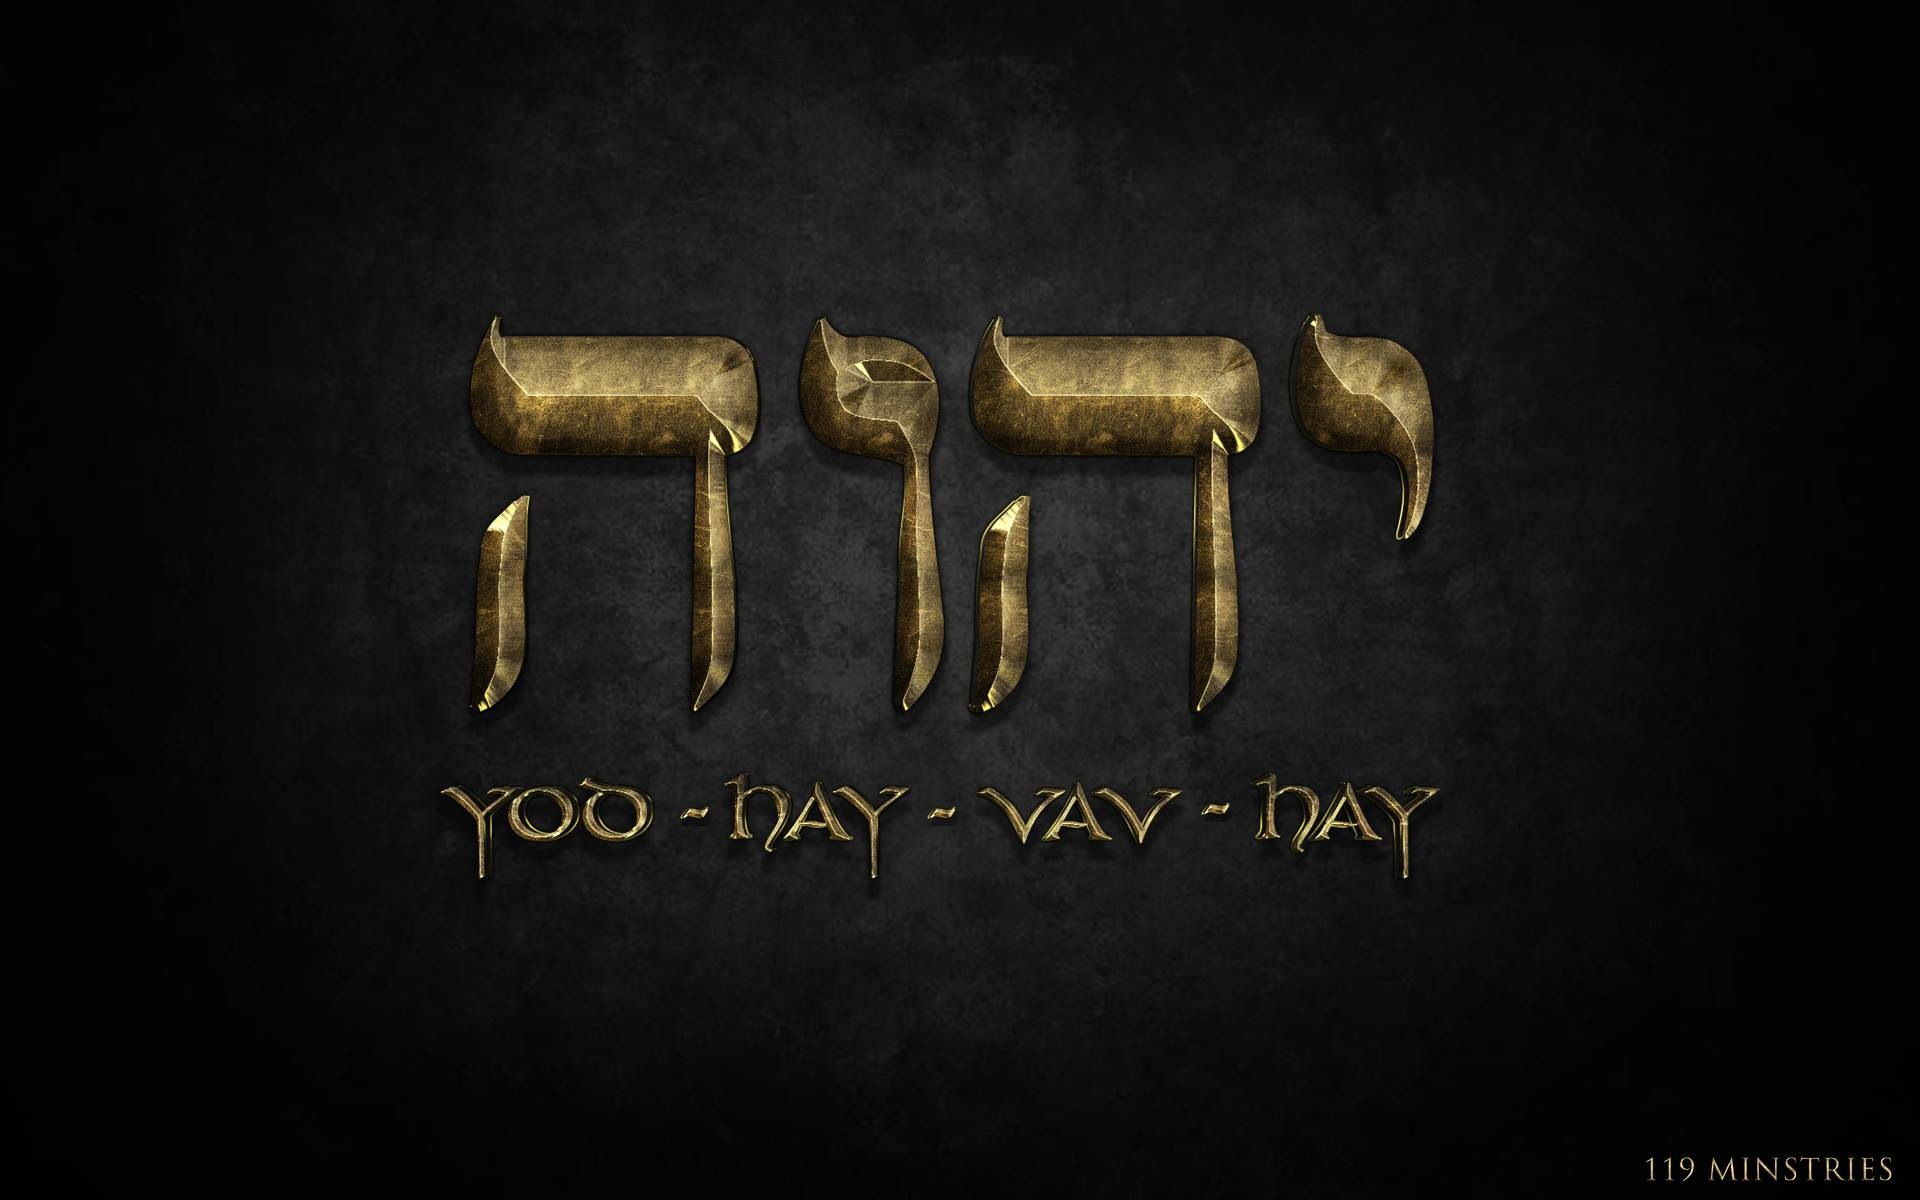 Yeshua Hamashiach Torah   newhairstylesformen2014.com